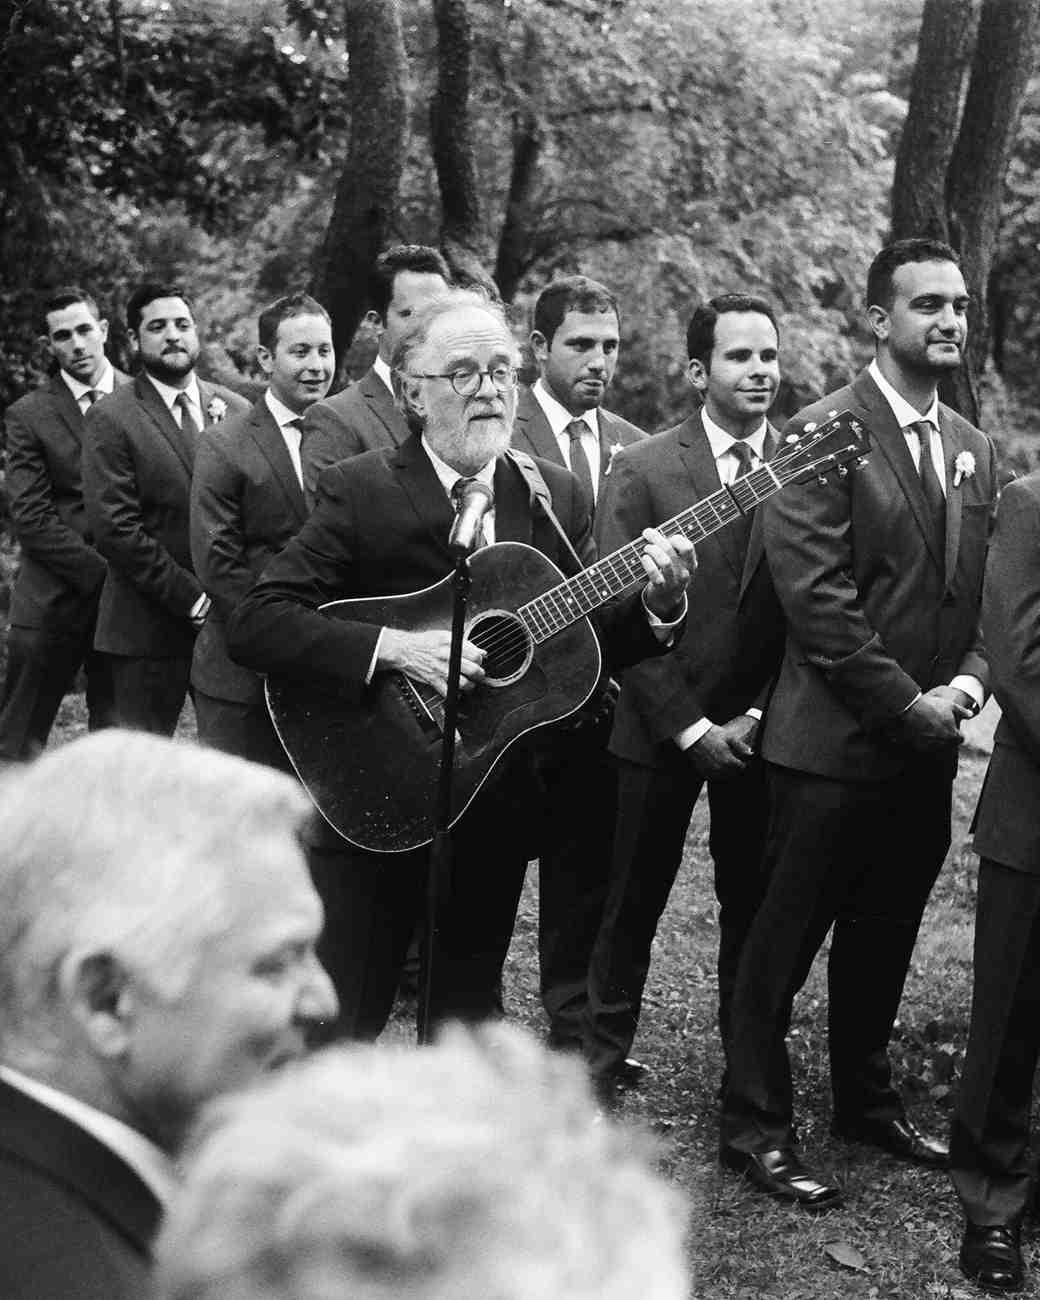 beth-scott-wedding-guitar-0594-s112077-0715.jpg